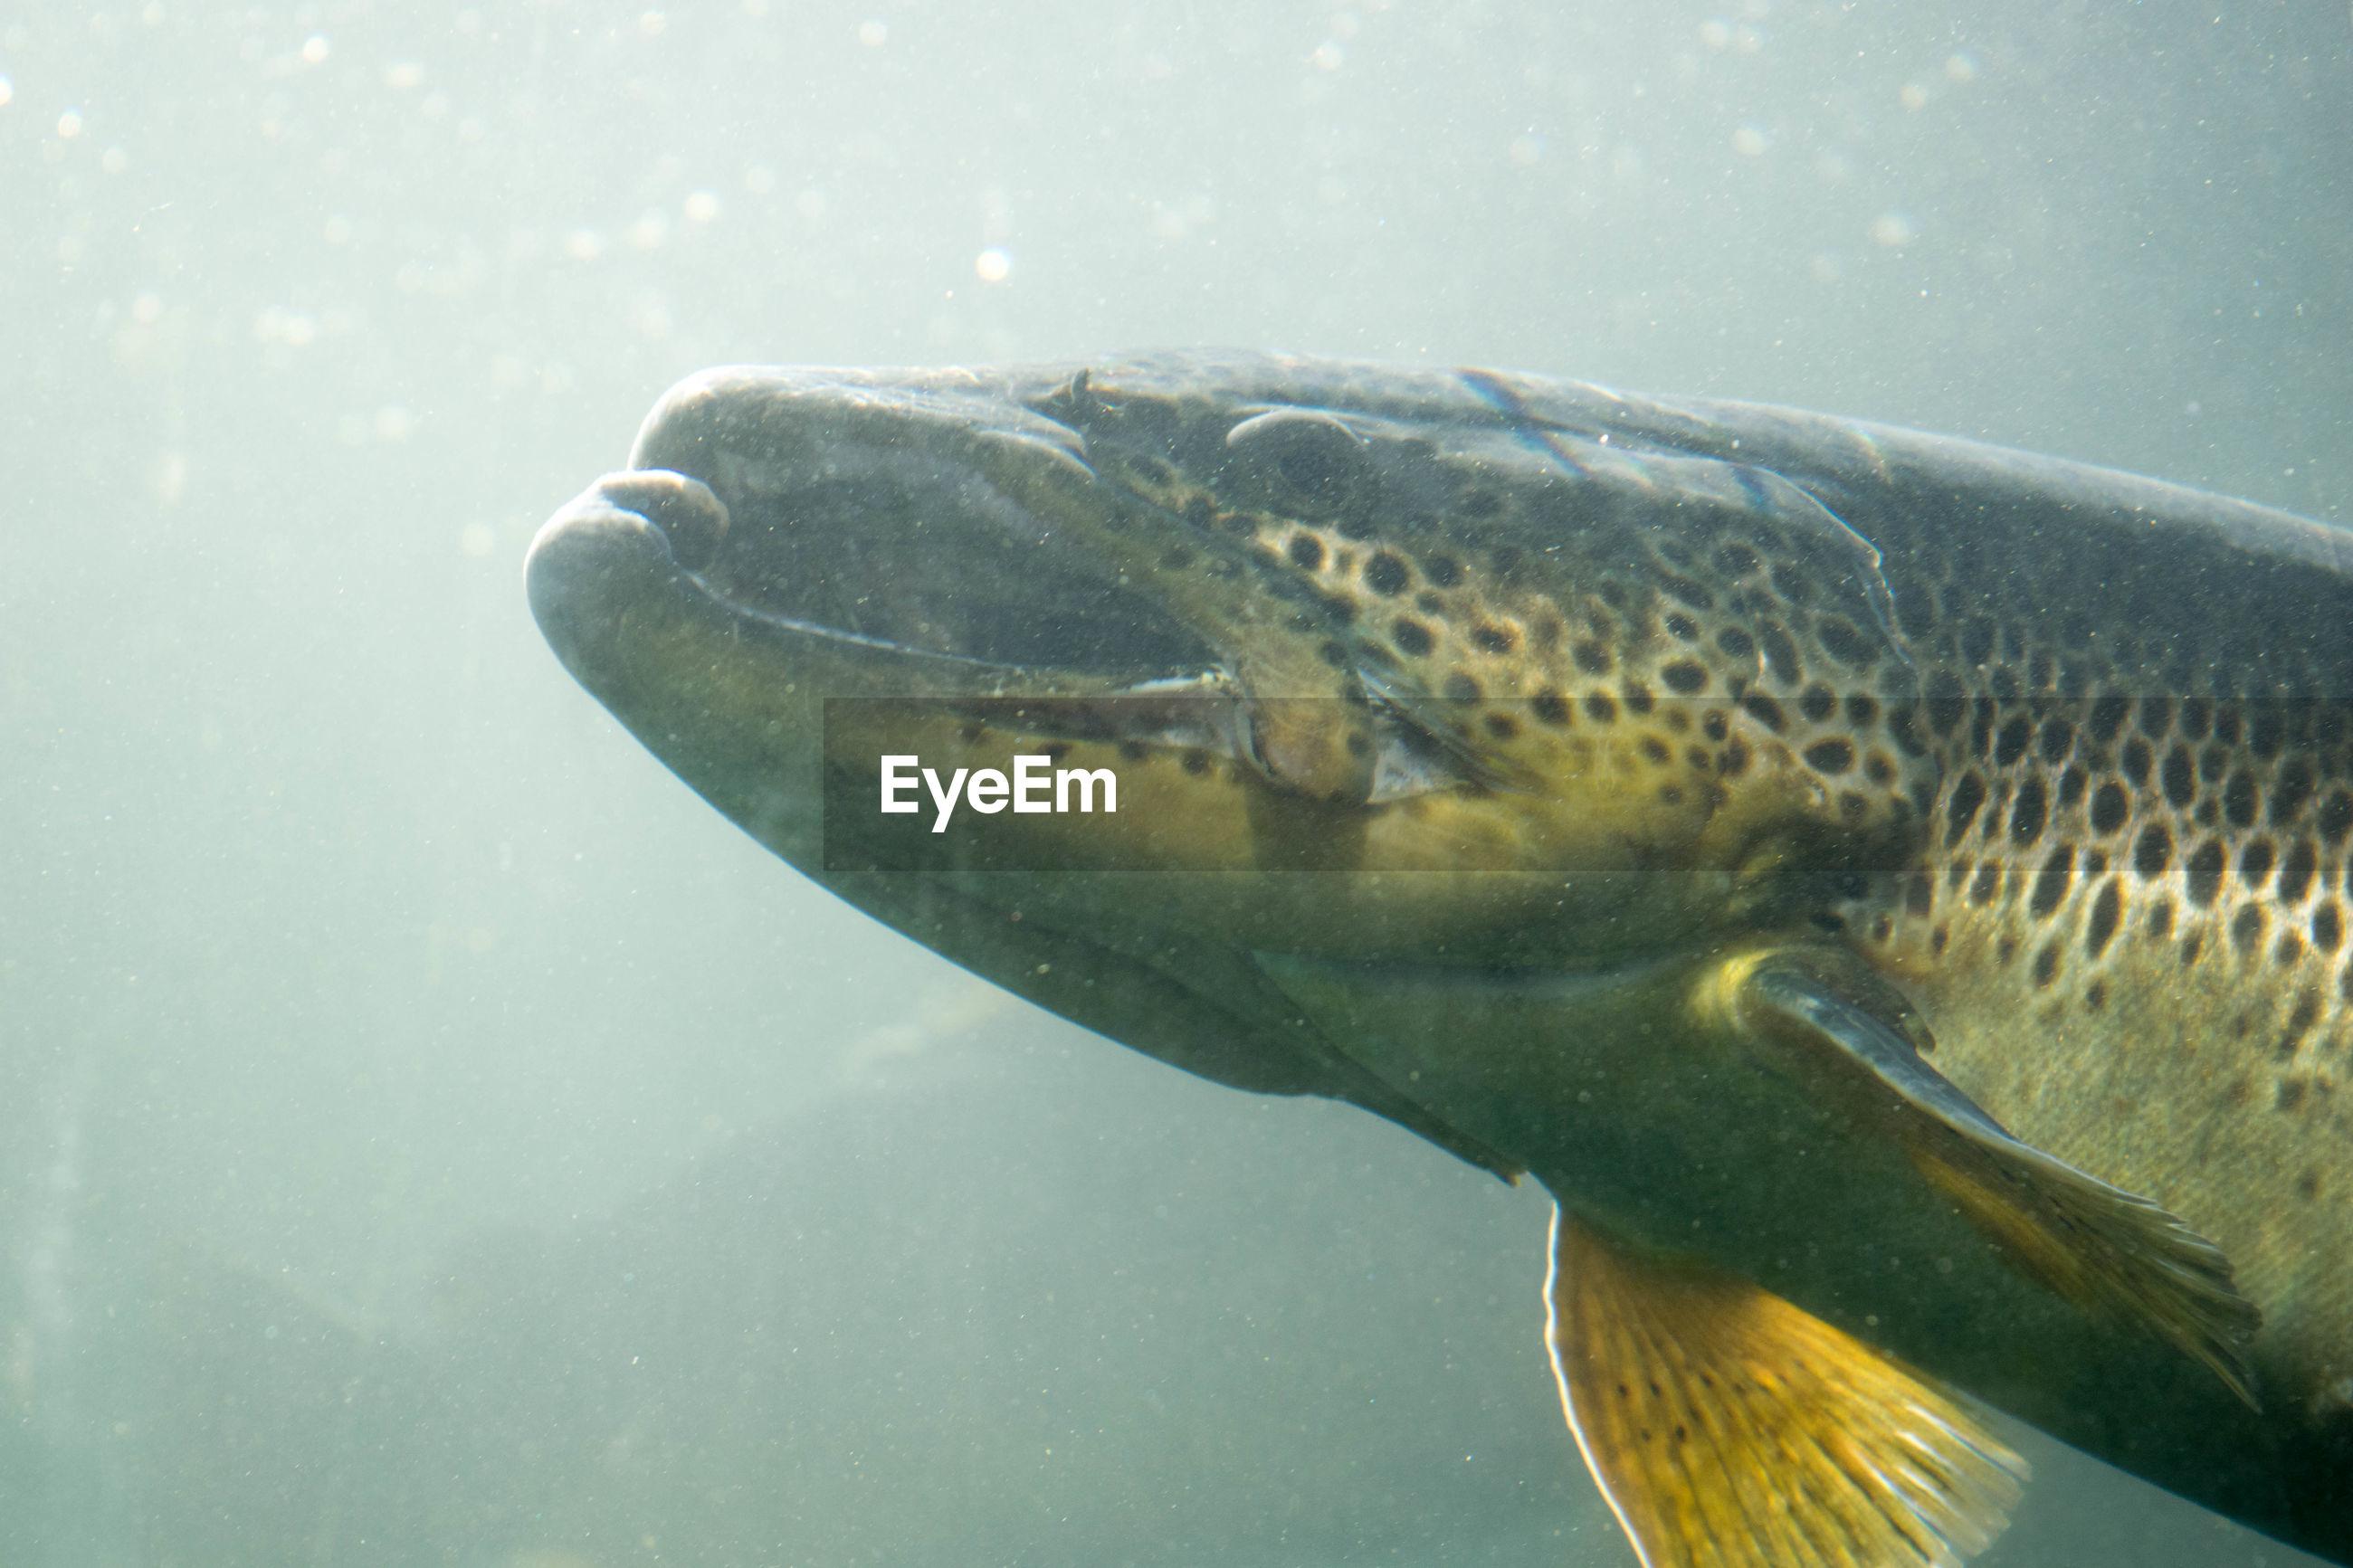 Close-Up Of Rainbow Trout Swimming In Tank At Aquarium